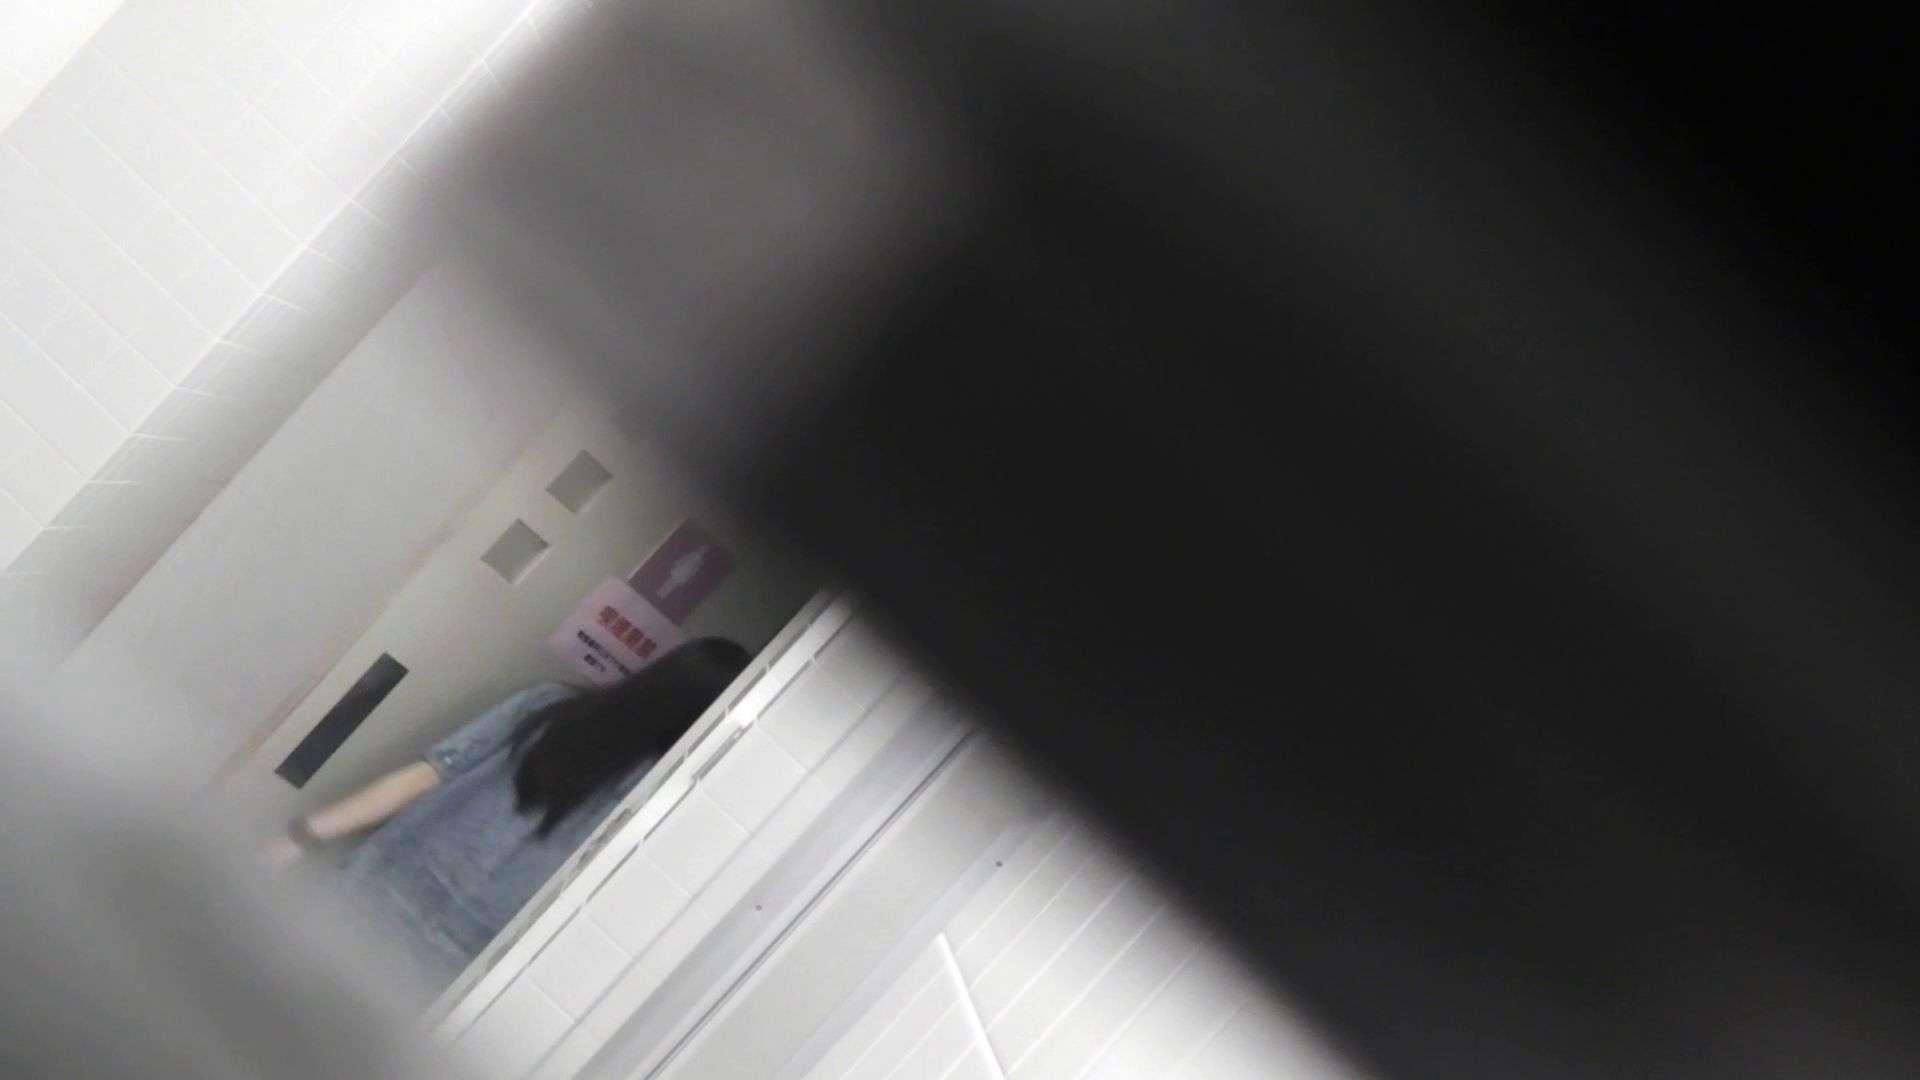 vol.20 命がけ潜伏洗面所! 清楚系可愛いギャル ギャルエロ画像   OLエロ画像  56PICs 13